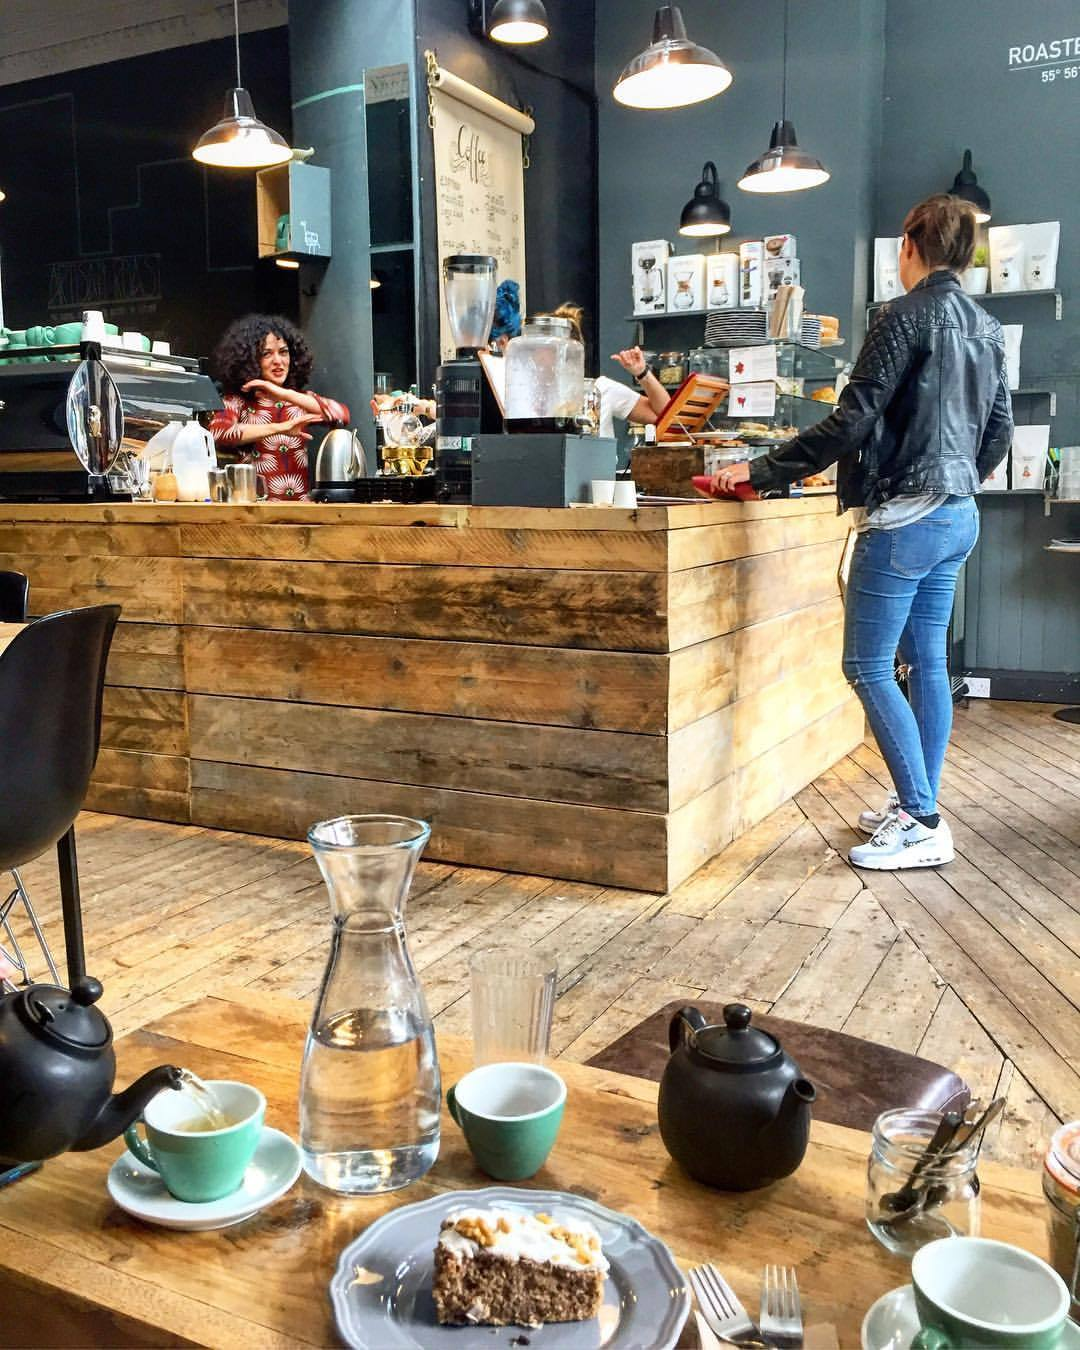 Coffee and cake.  #scotland #edinburgh #uk #coffee  (at Artisan Roast _ Stockbridge)